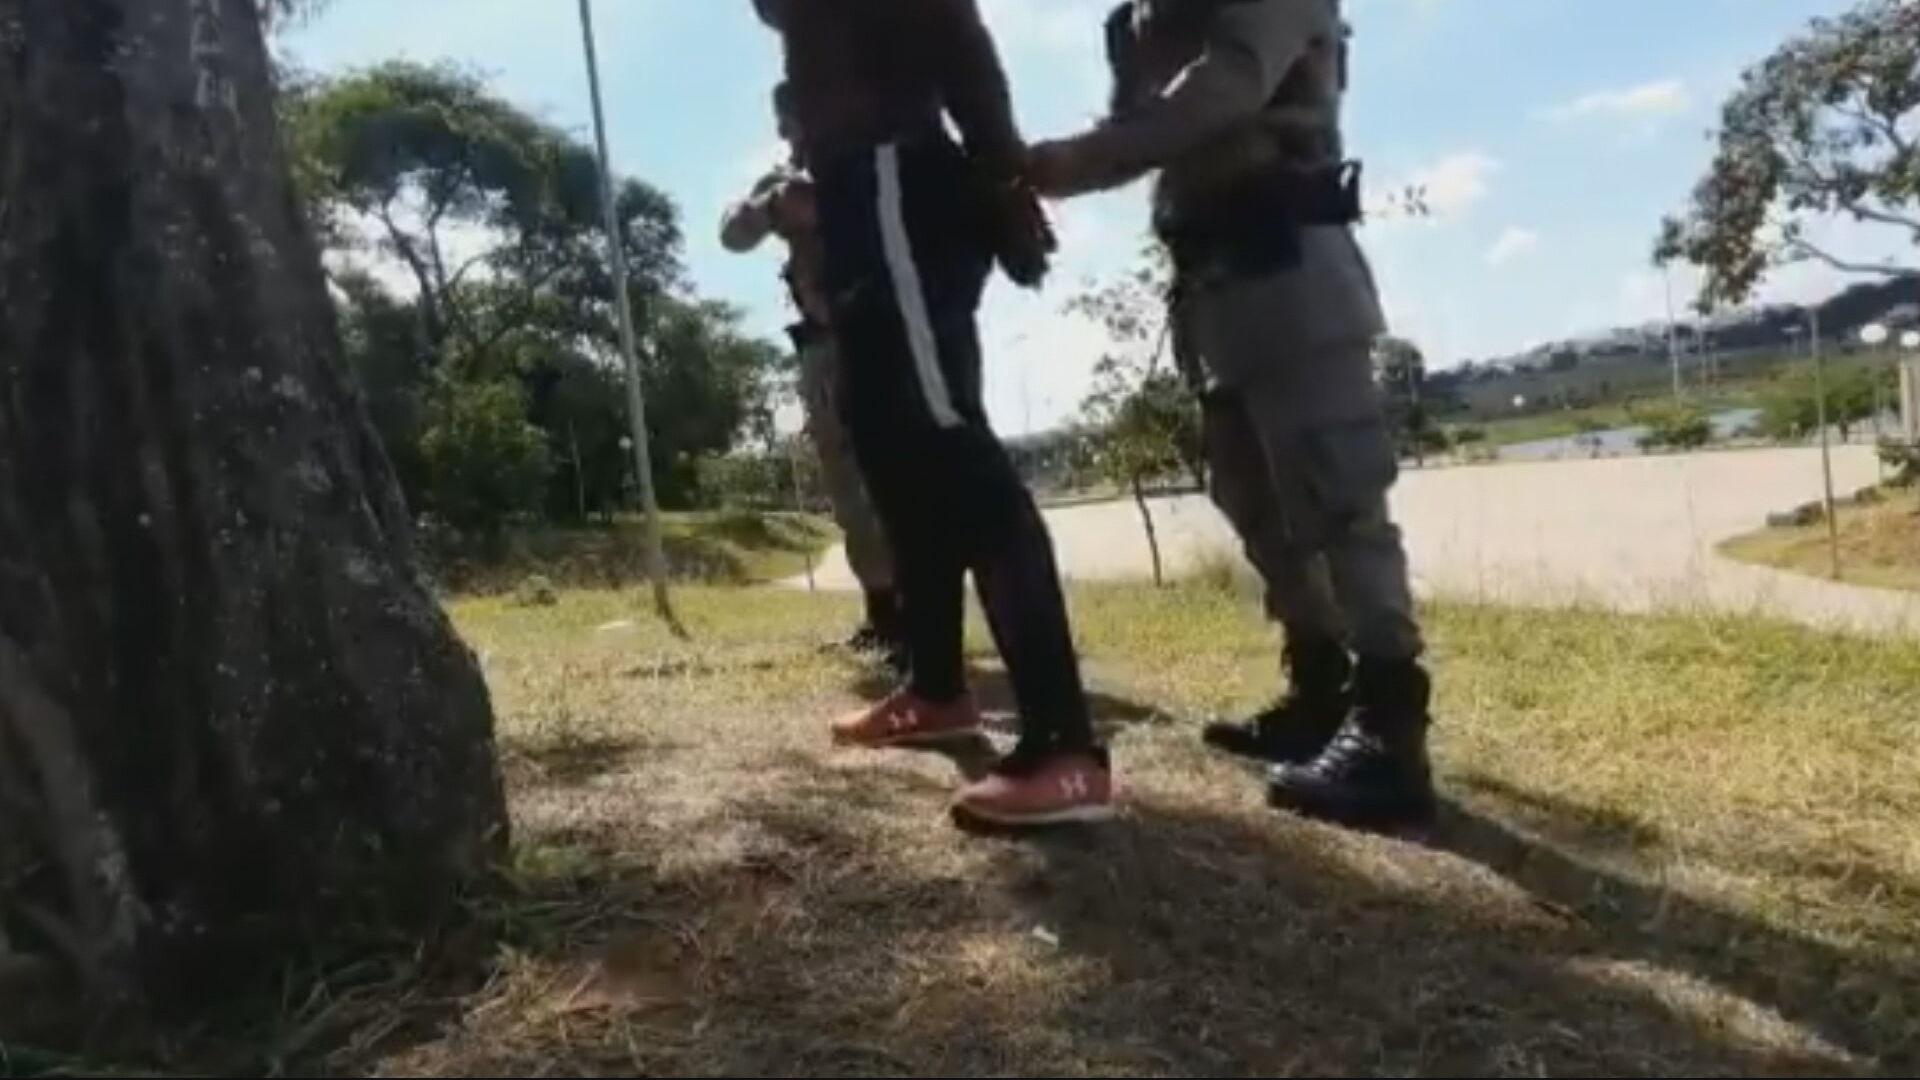 MP investiga abordagem policial a homem negro (29-05-2021)